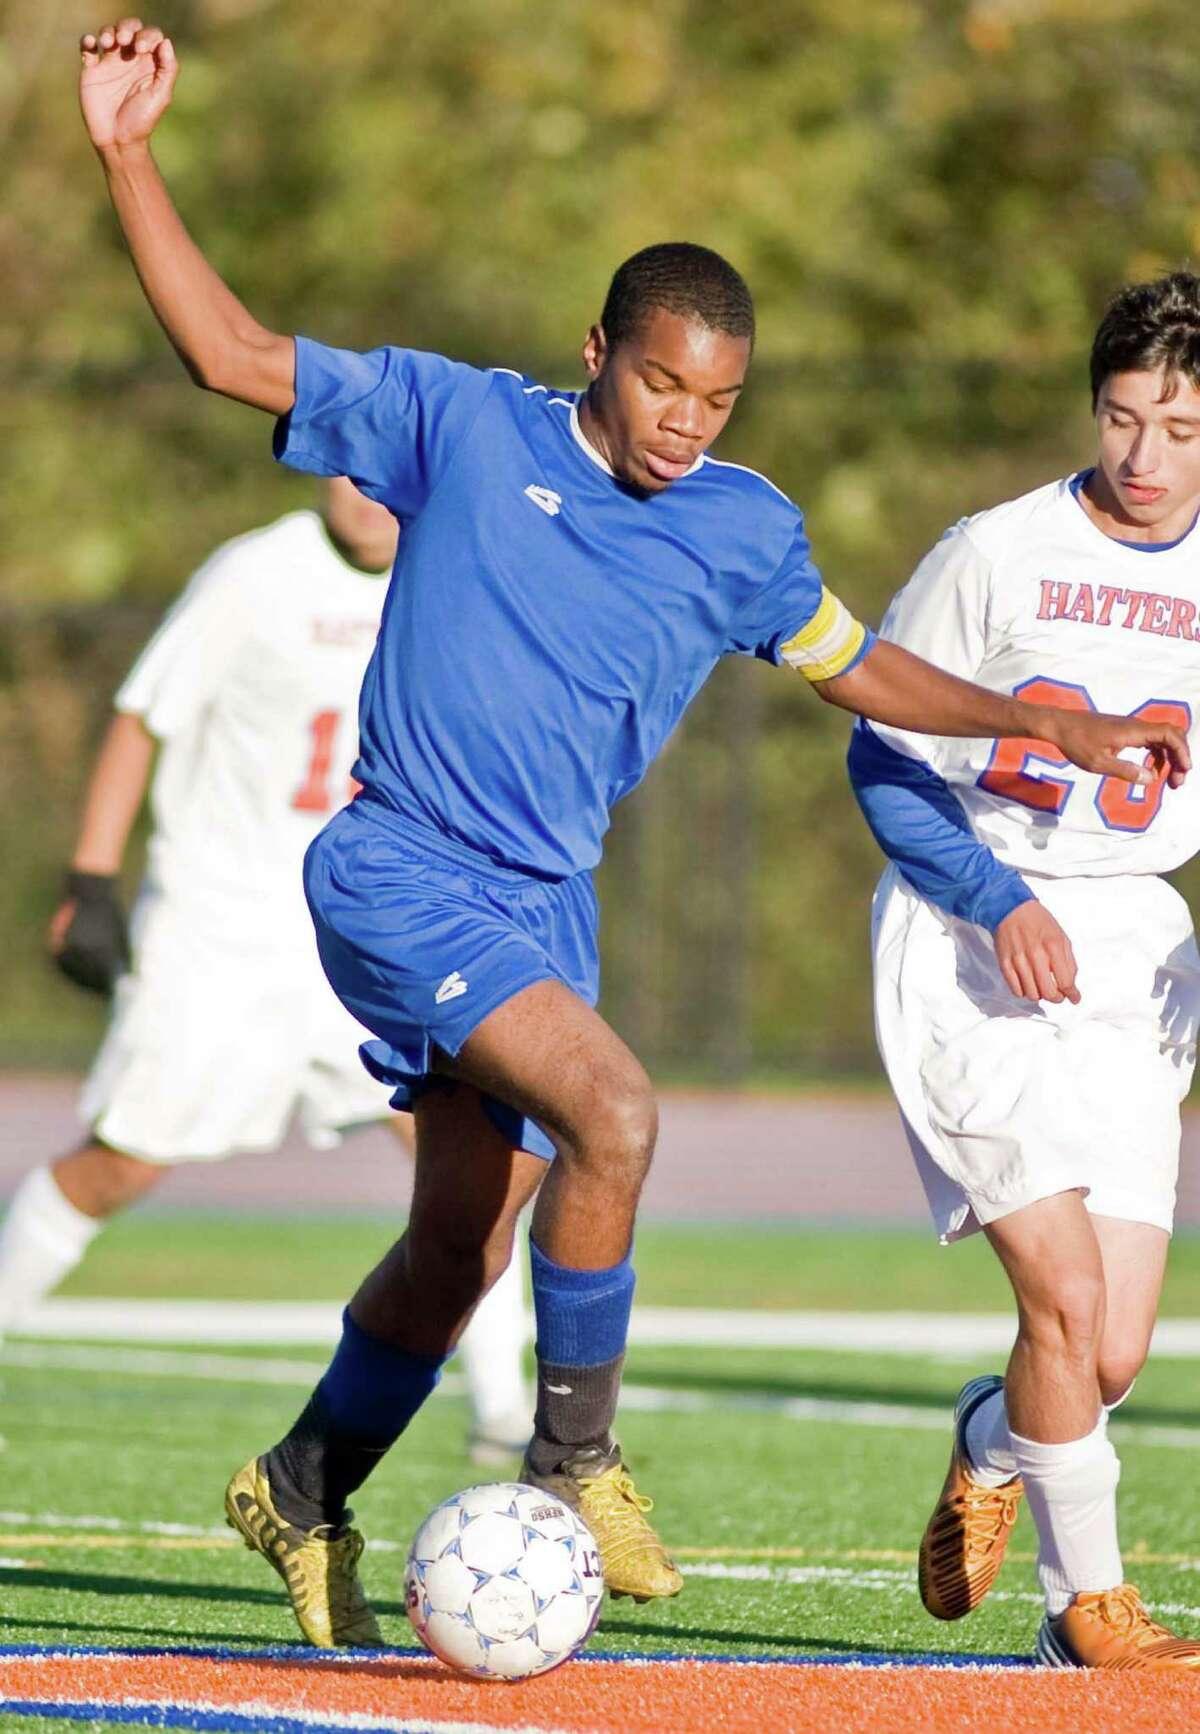 Harding High School's Ocasio Brown maneuvers the ball against Danbury High School in a game at Danbury. Tuesday, Oct. 16, 2012